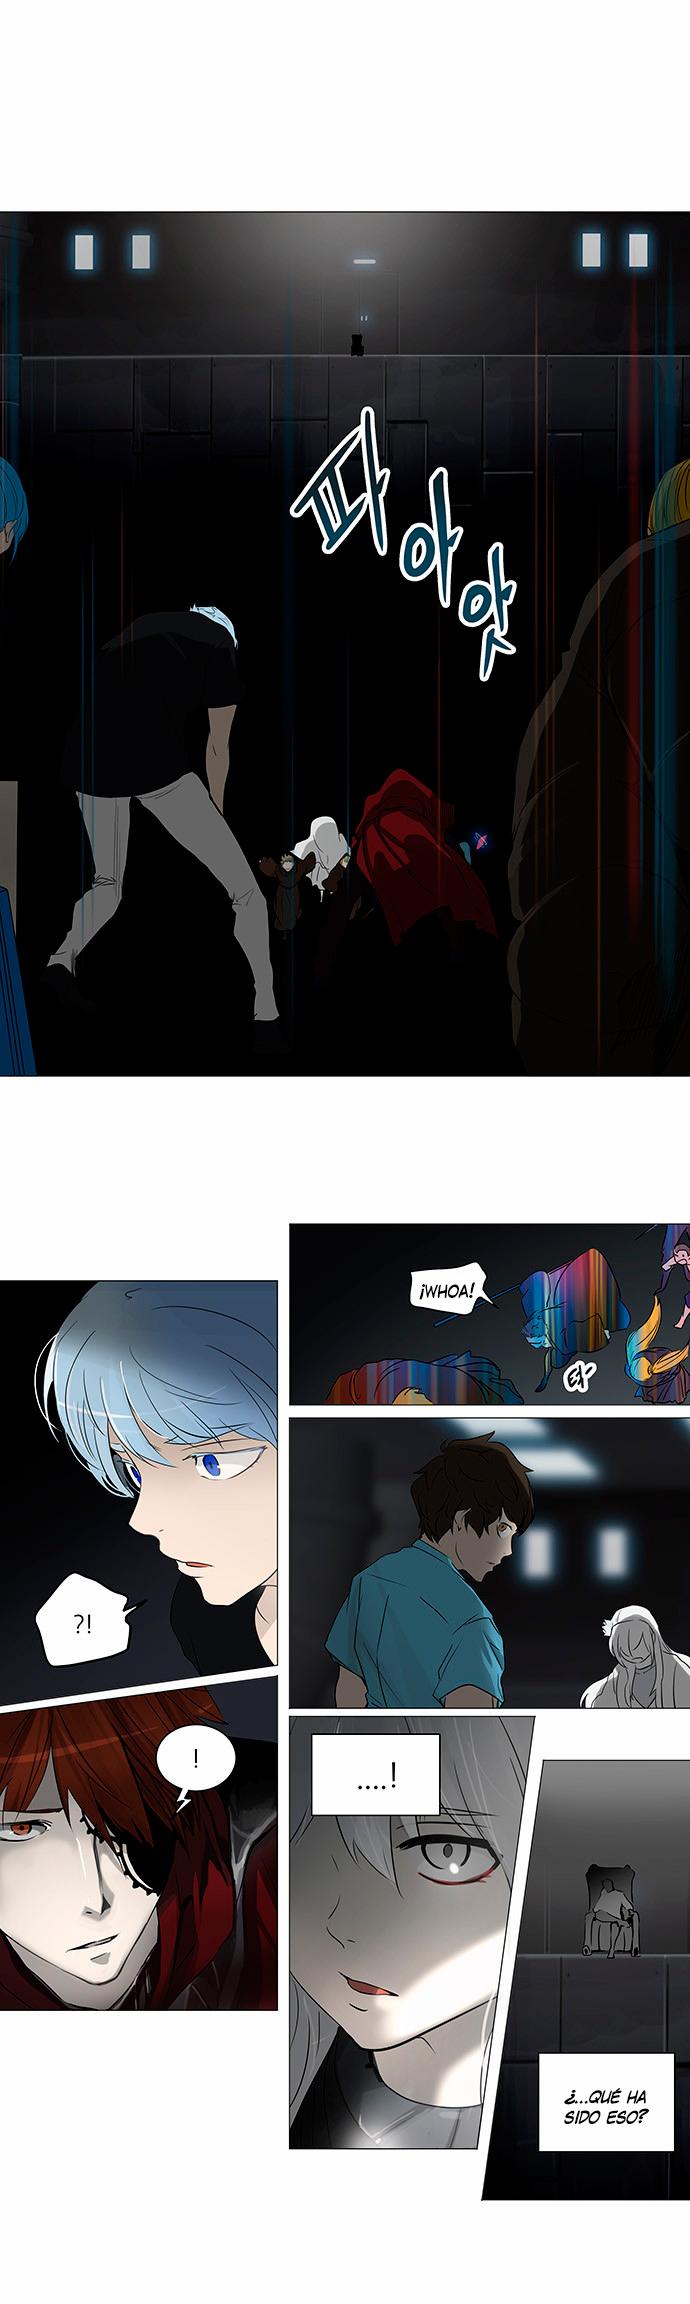 http://c5.ninemanga.com/es_manga/21/149/414801/cc431fd7ec4437de061c2577a4603995.jpg Page 5